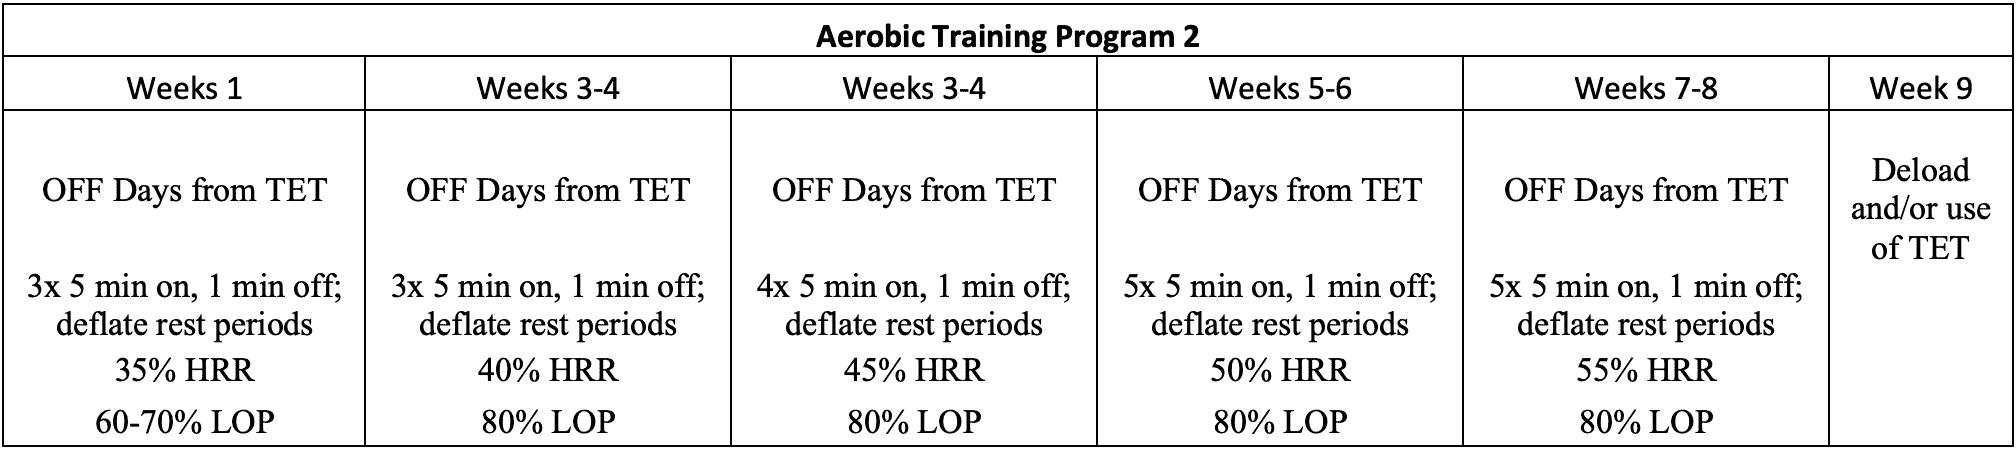 blood flow restriction endurance training